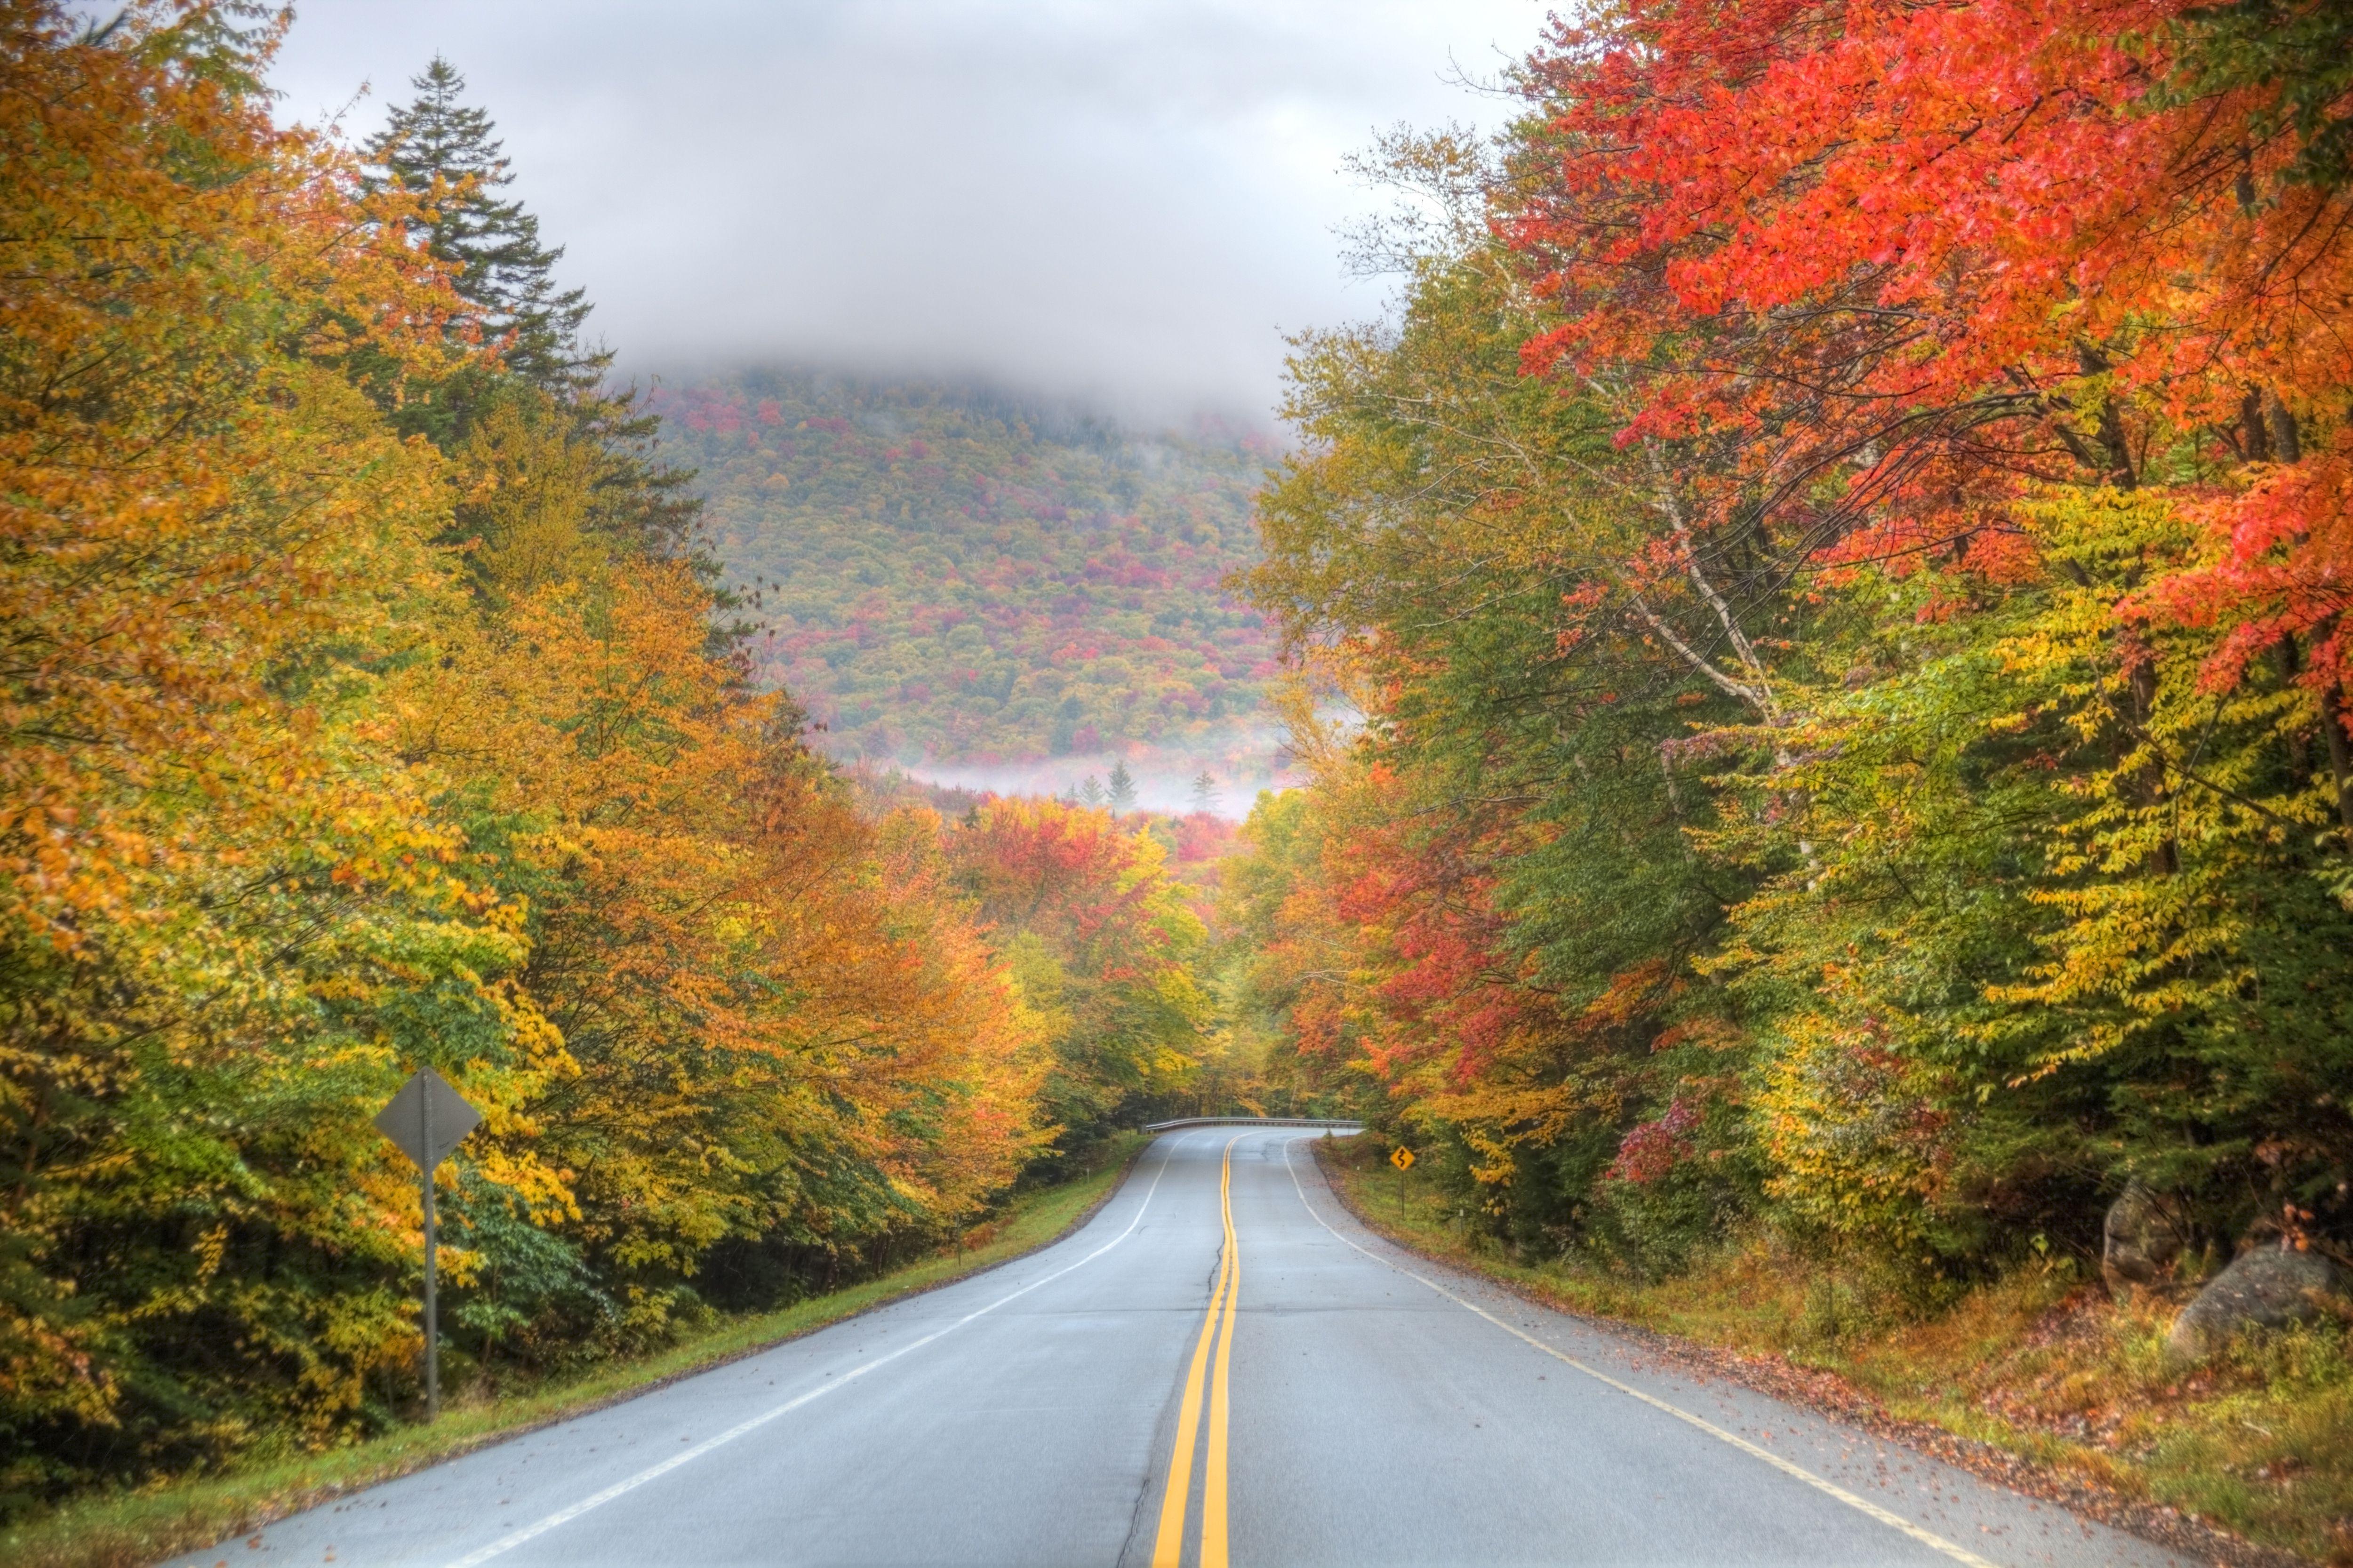 Fall Foliage Wallpaper Screensavers Kancamagus Highway Best New England Scenic Drive